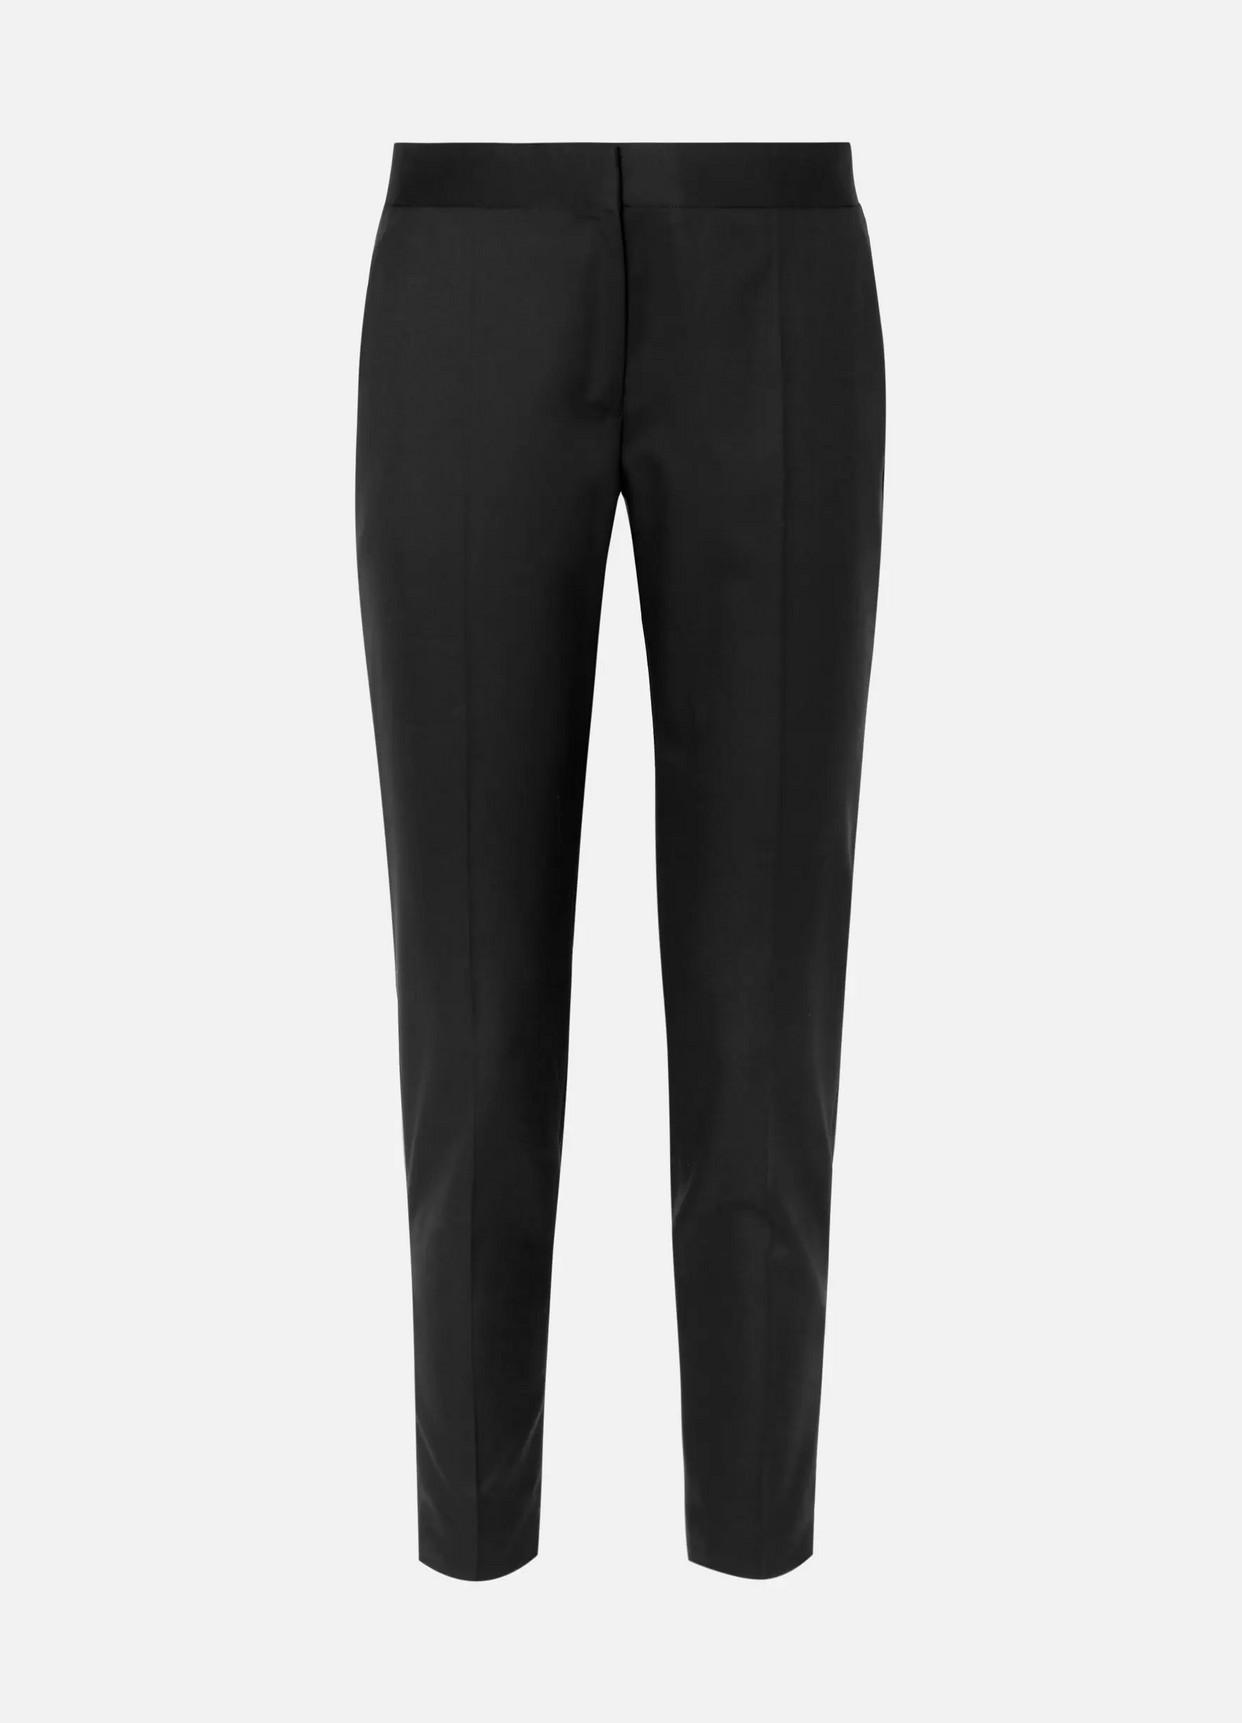 STELLA MCCARTNEY - Vivian Zip-detailed Wool-twill Straight-leg Pants - Black - IT36